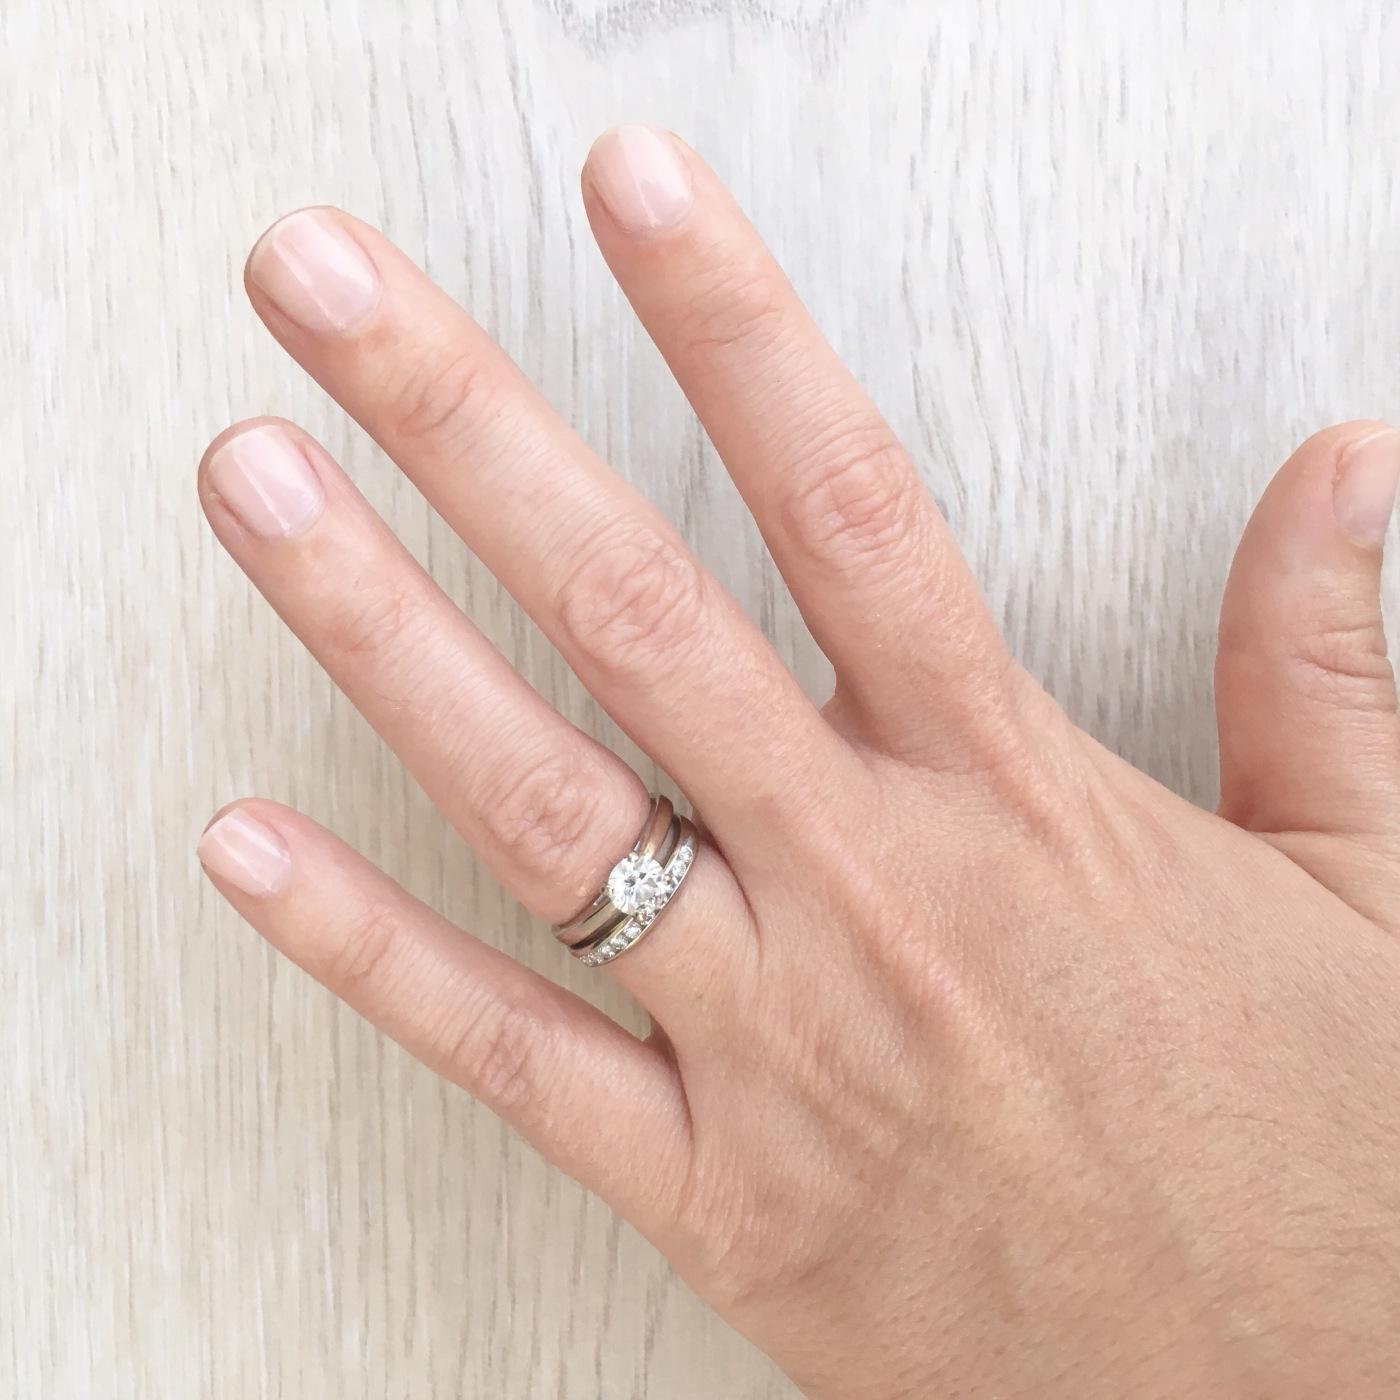 Essie Gel Couture Sheer Fantasy Manicure